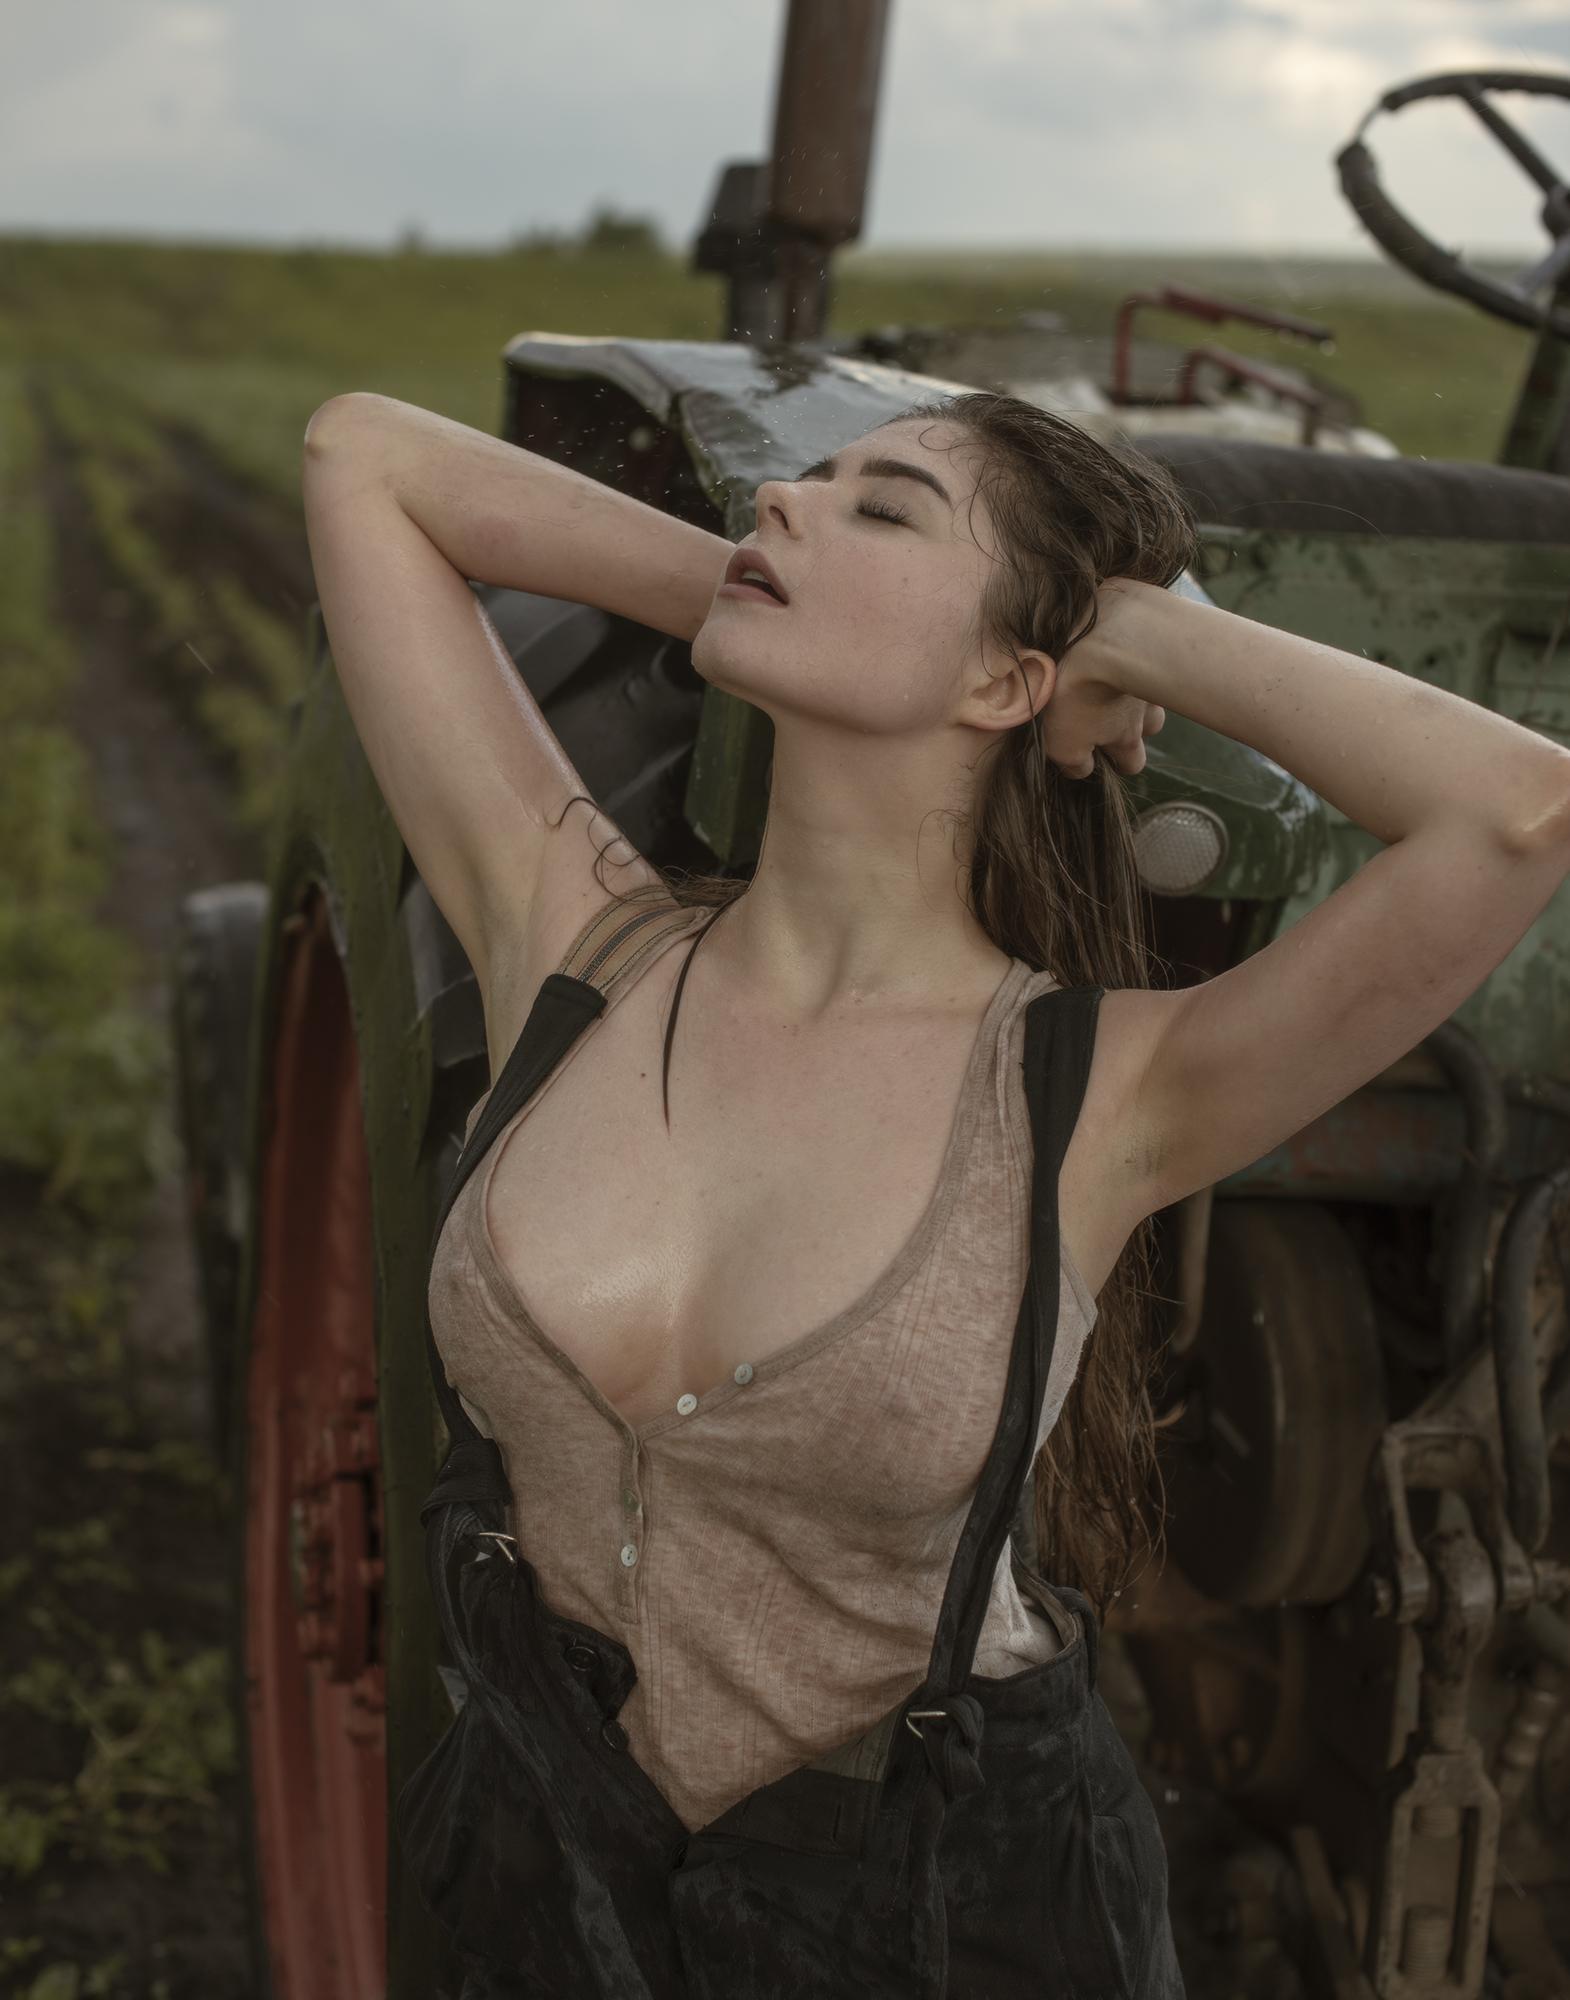 Мокро / фотограф Давид Дубницкий